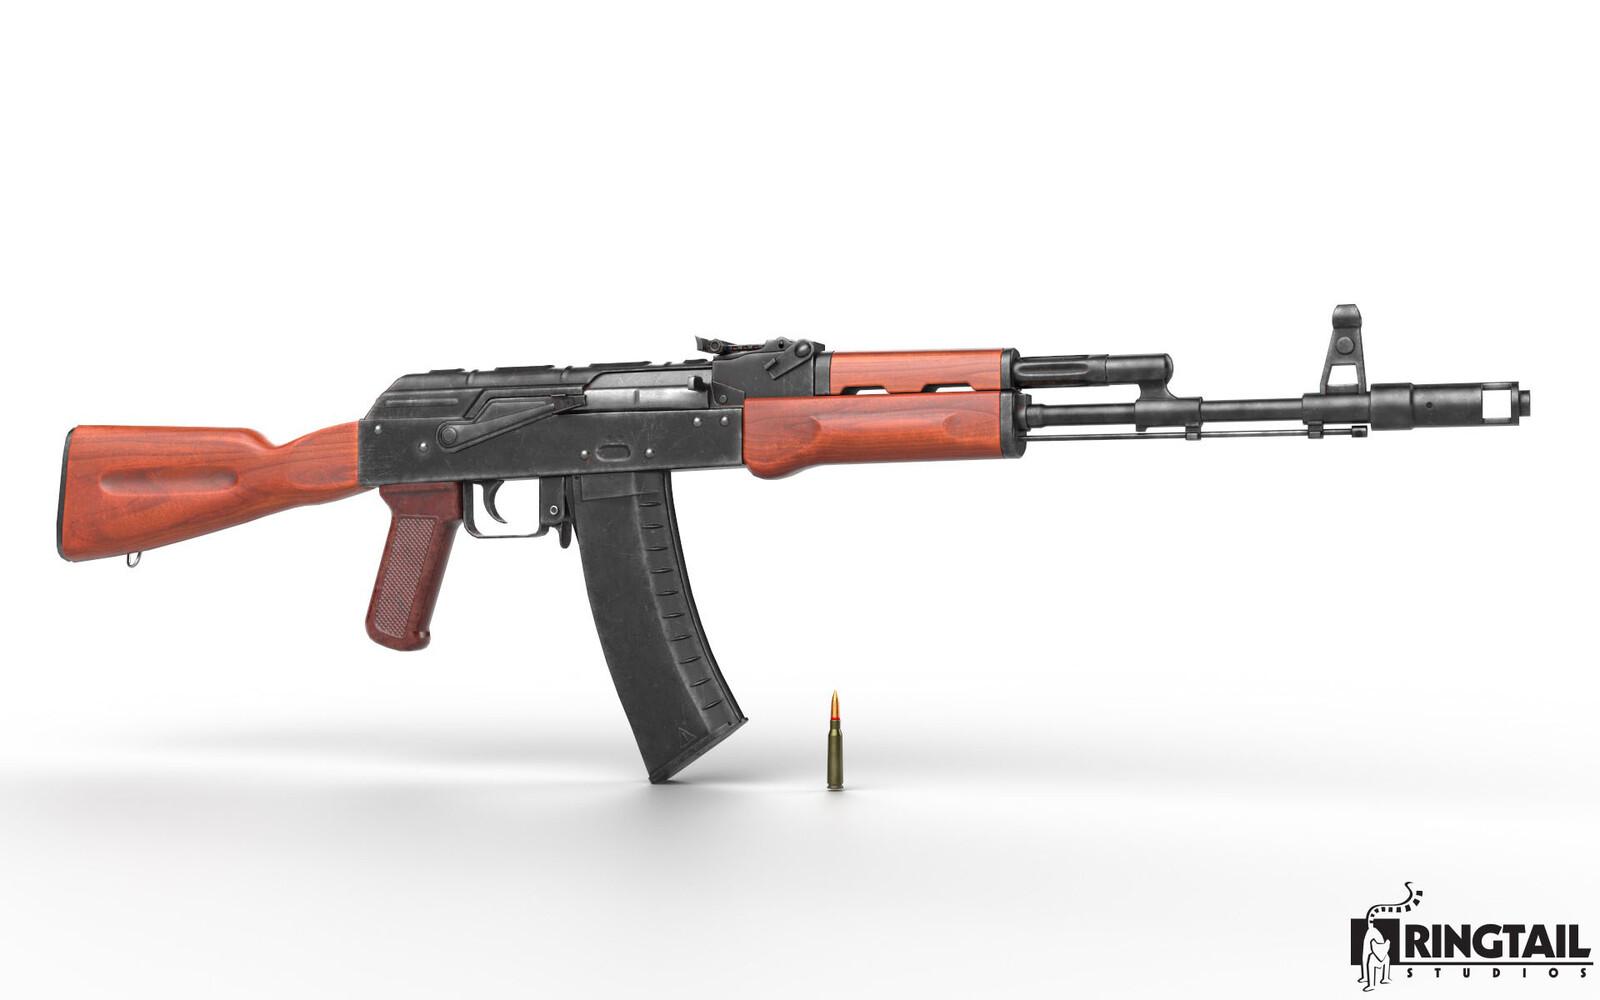 AK - 74